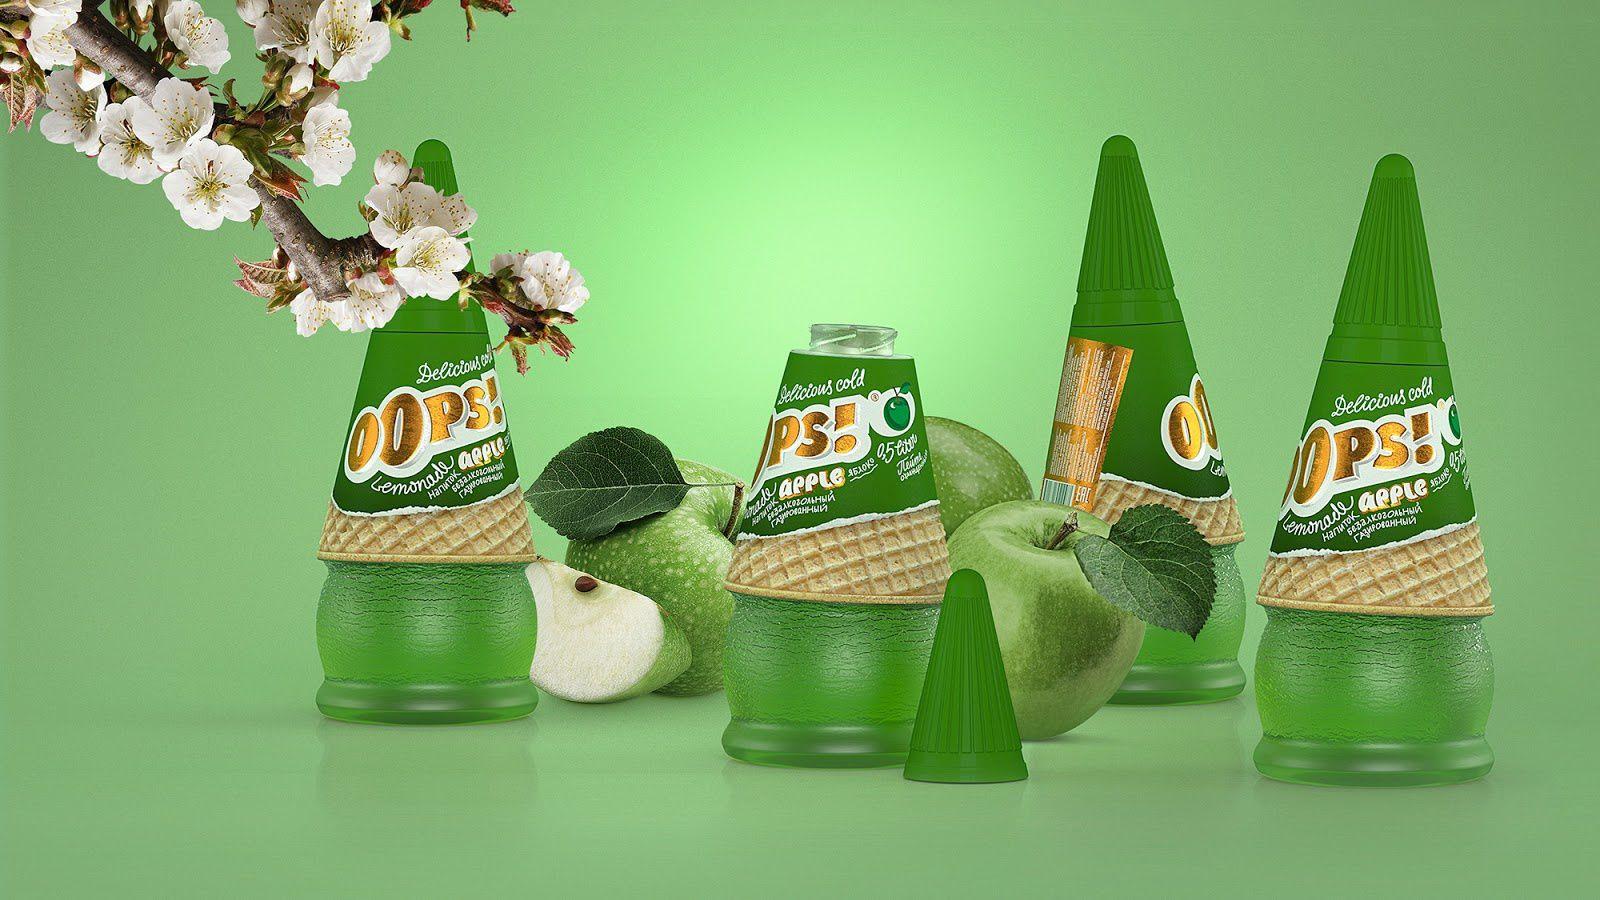 Oops! (limonades) I Design (concept) : NovaBrand, Rostov-on-Don, Russie (mai 2019)